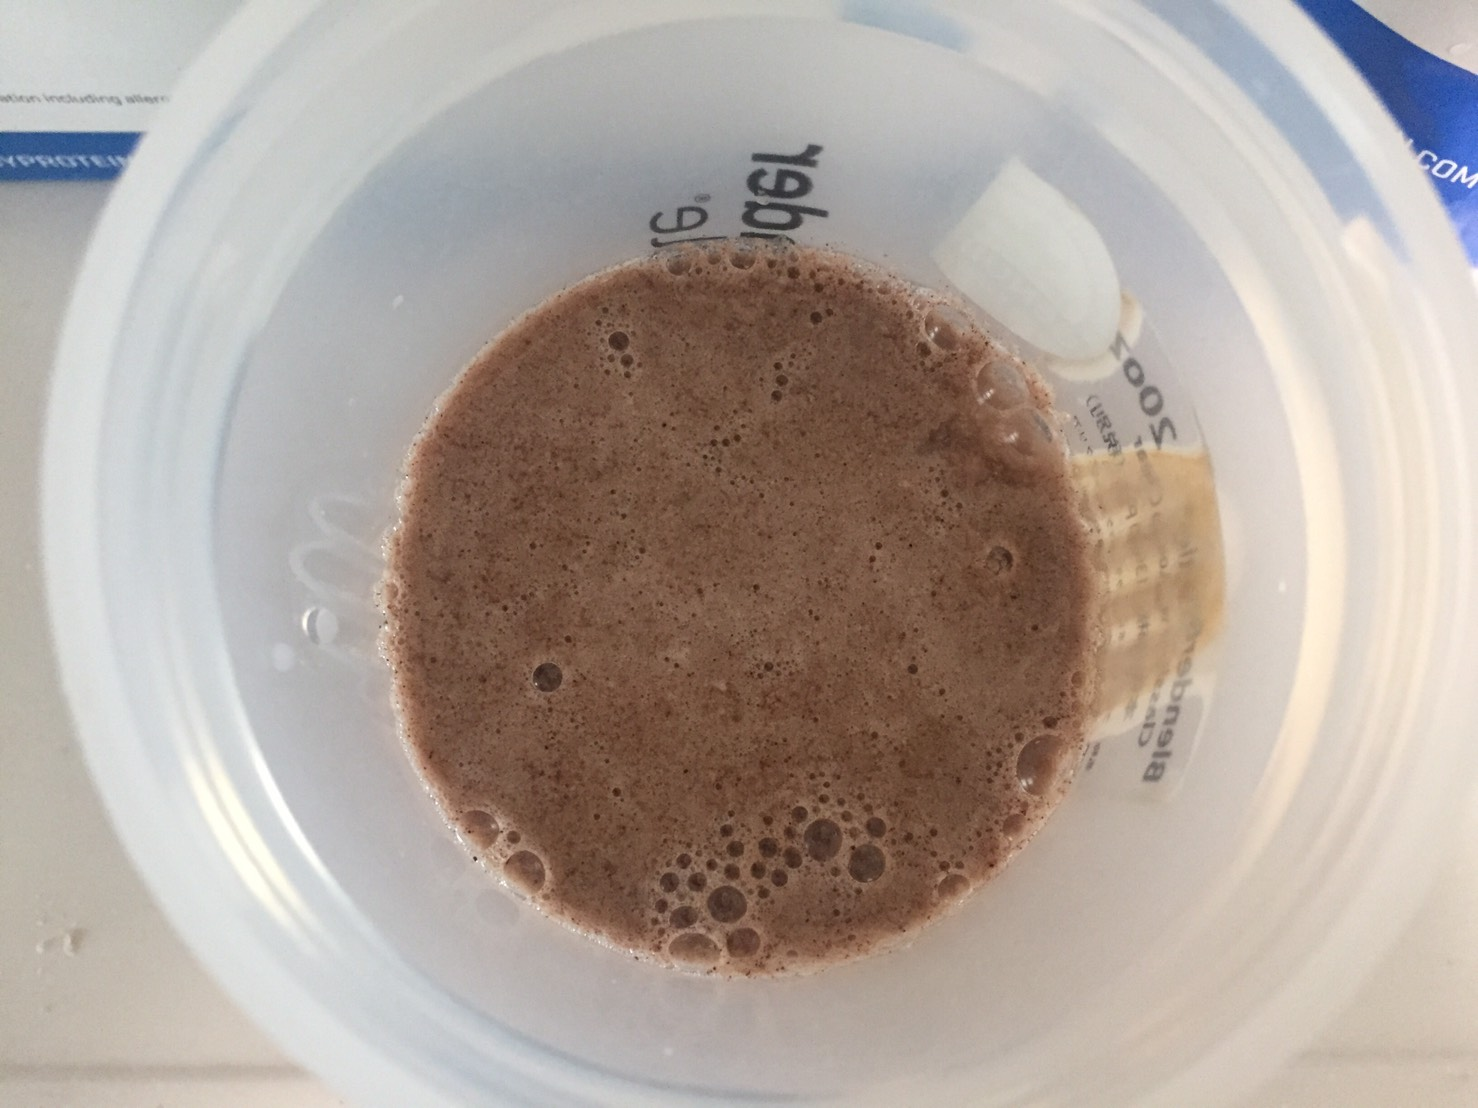 【WPI】IMPACT 分離ホエイプロテイン (アイソレート)「CHOCOLATE SMOOTH FLAVOUR(チョコレートスムーズ味)」を水に注いだ直後の様子